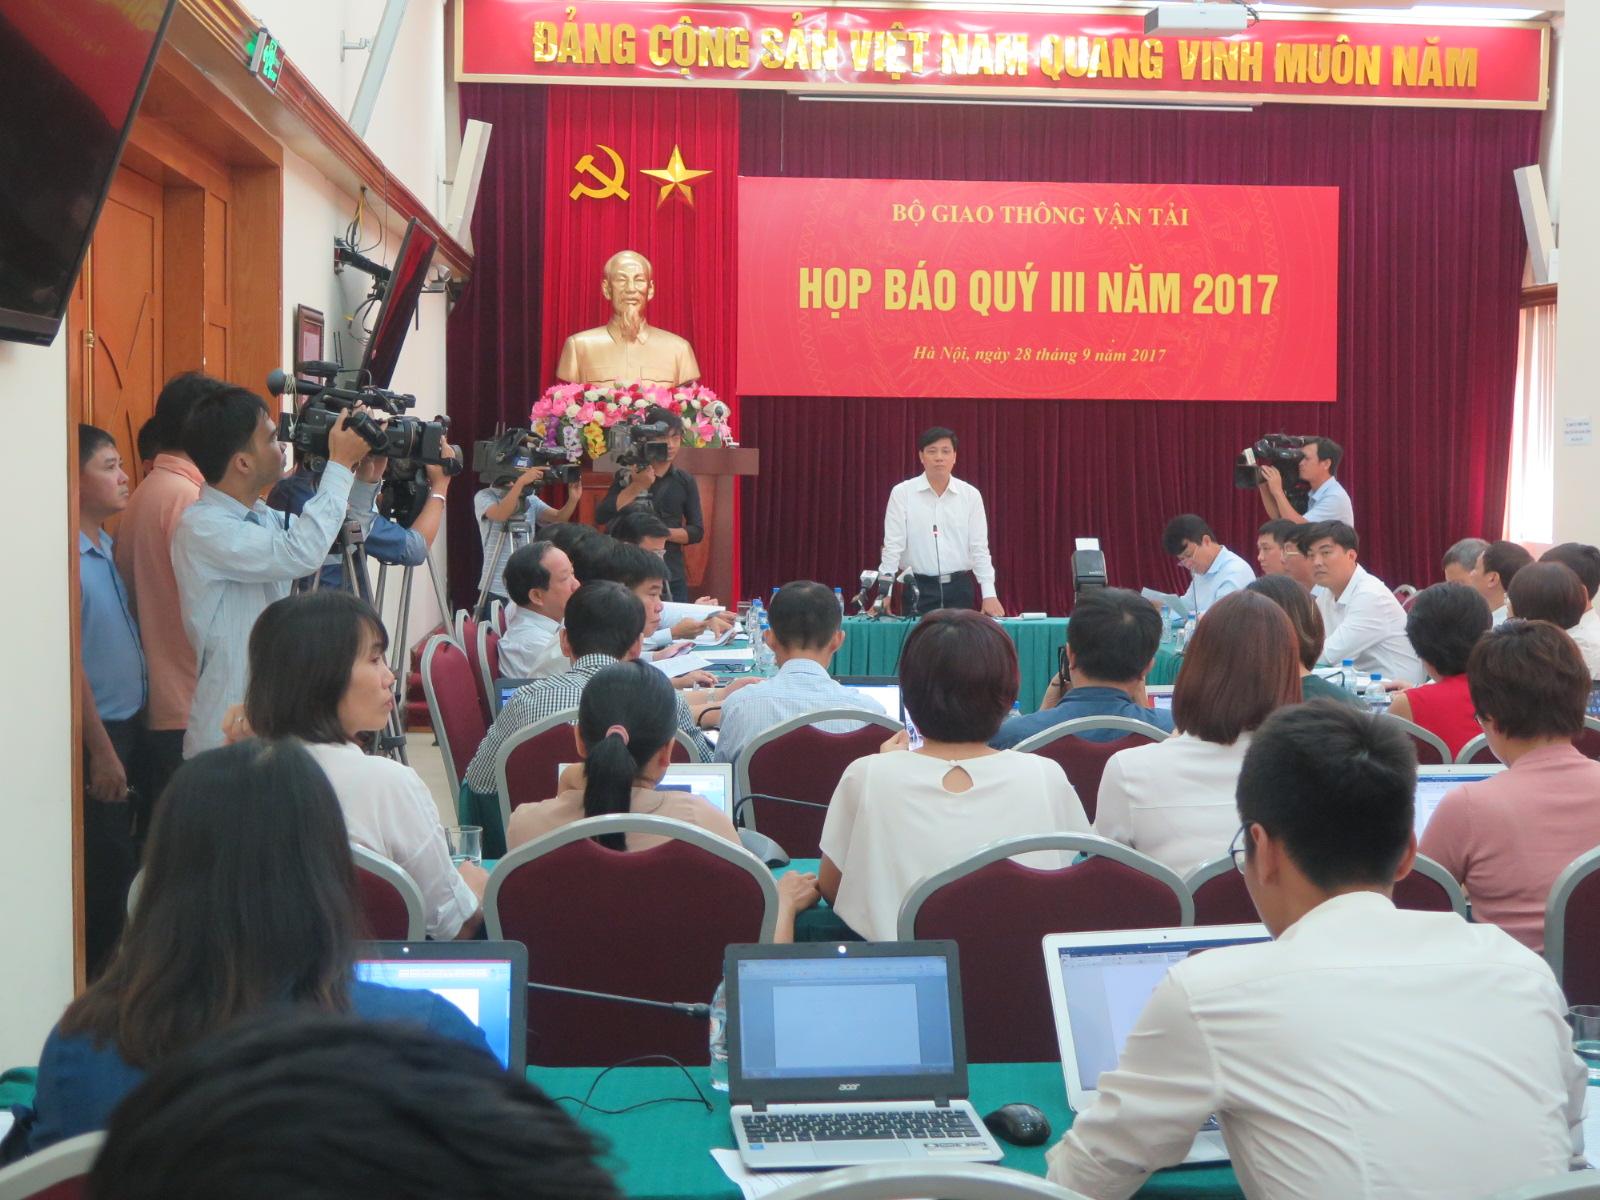 cat linh hadong metro line unable to start test runs in october